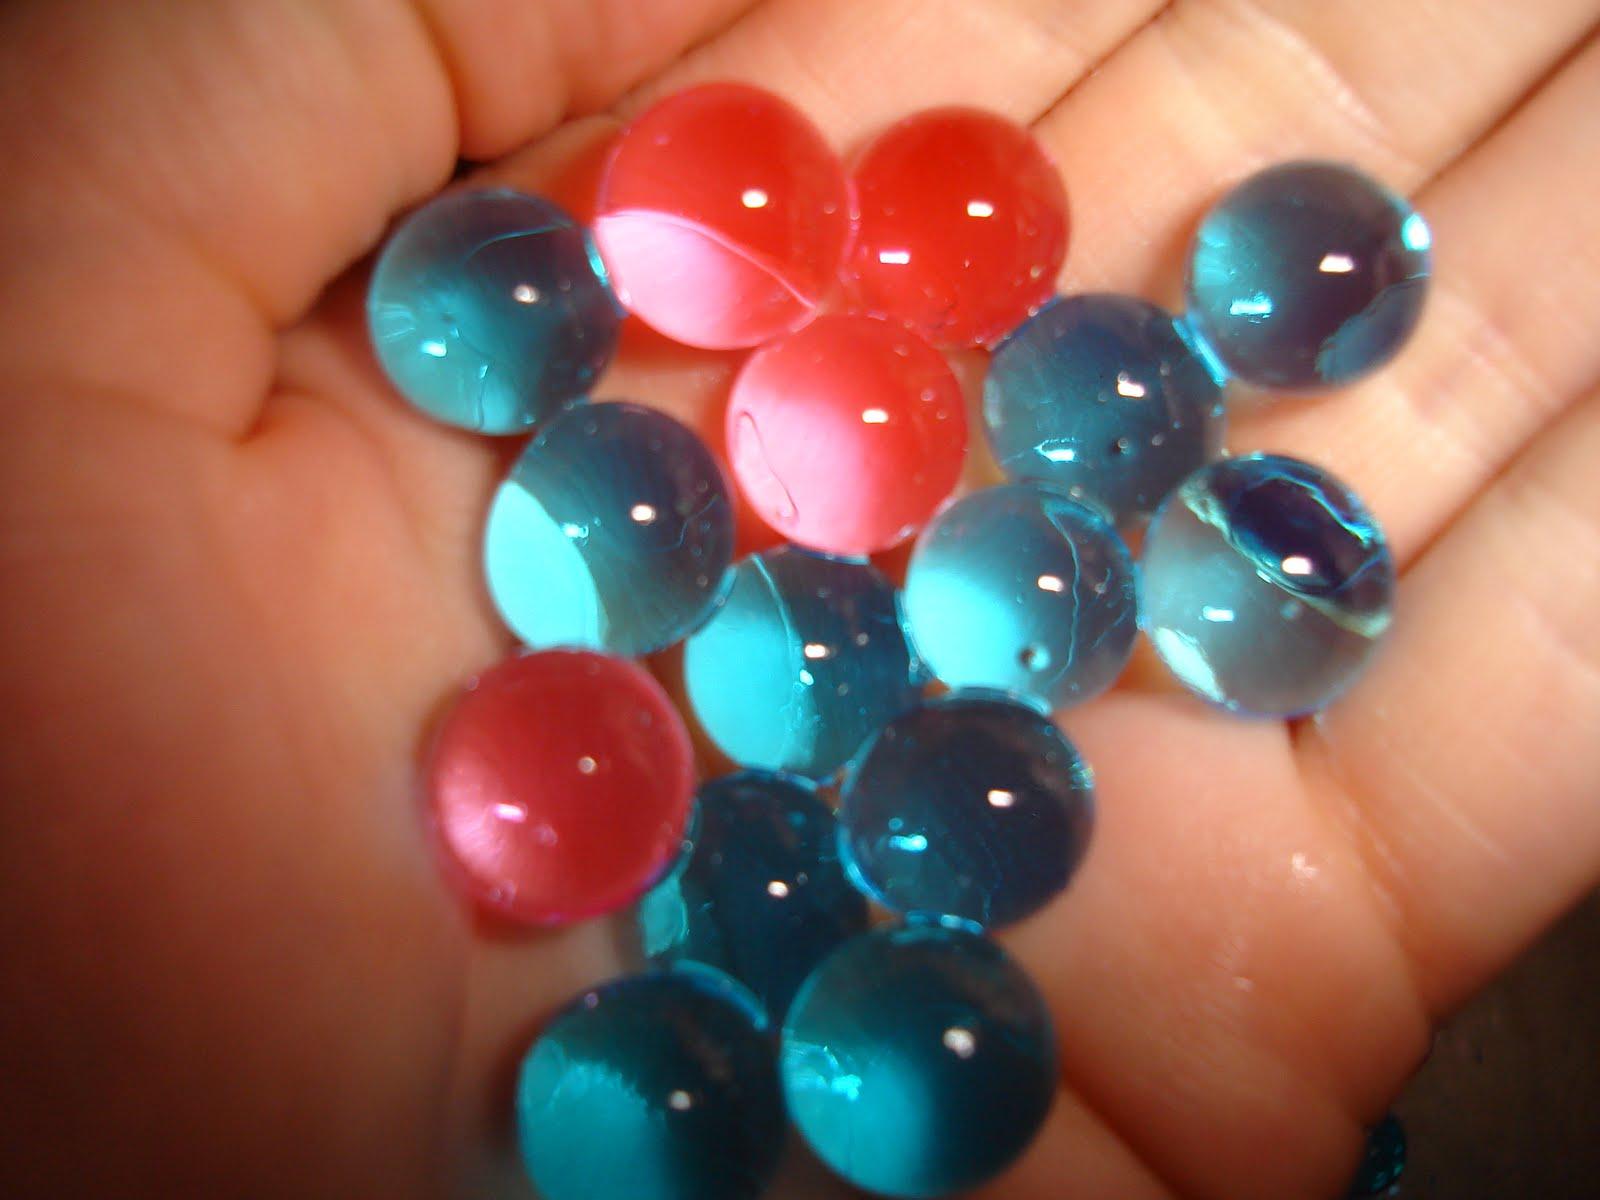 Как сделать шарики орбис в домашних условиях без желатина